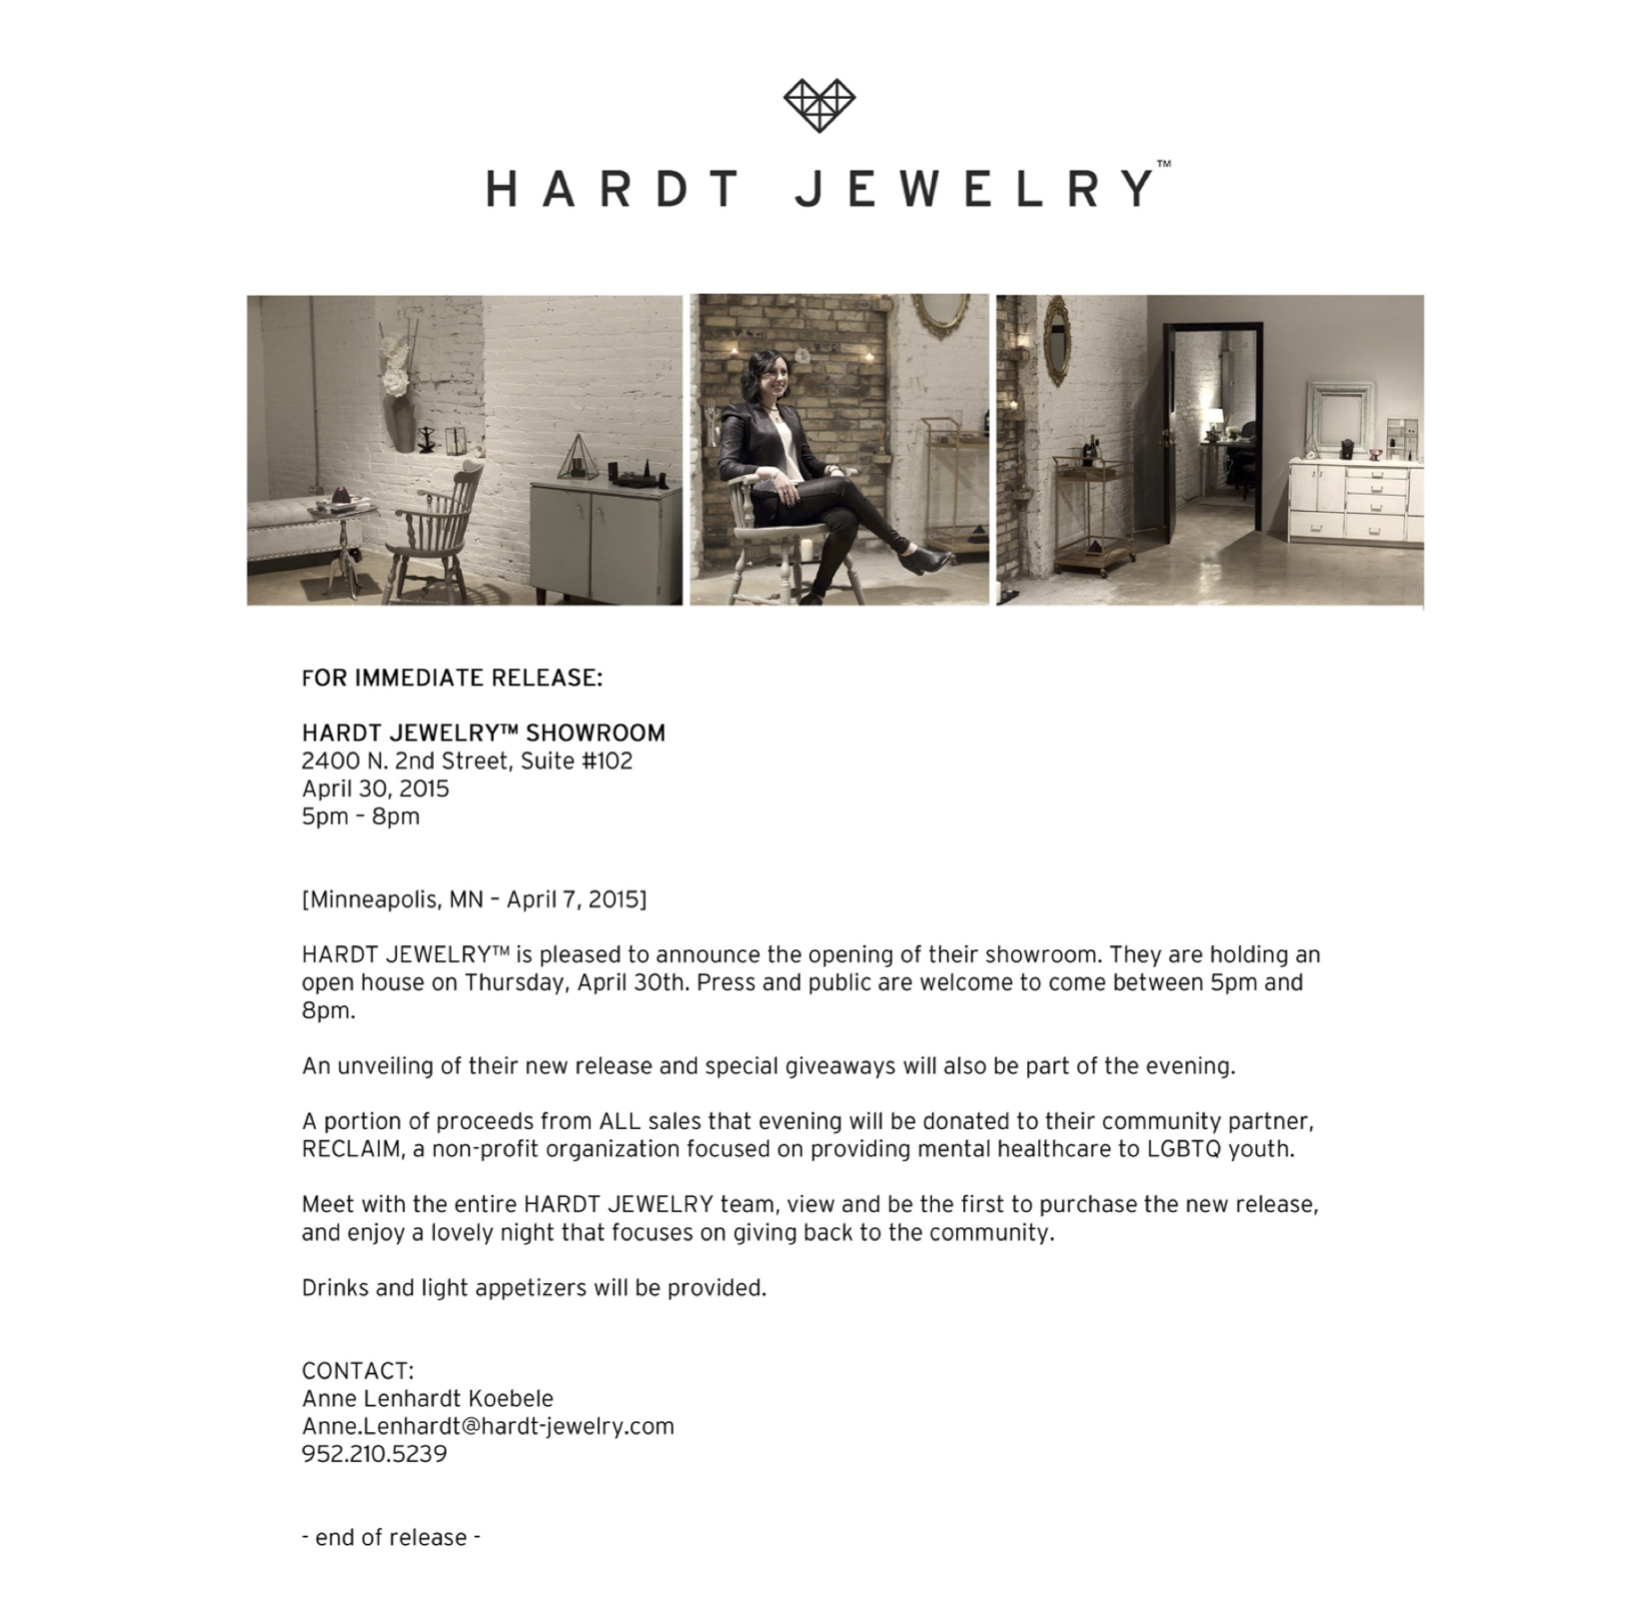 Hardt Jewelry Showroom Opening